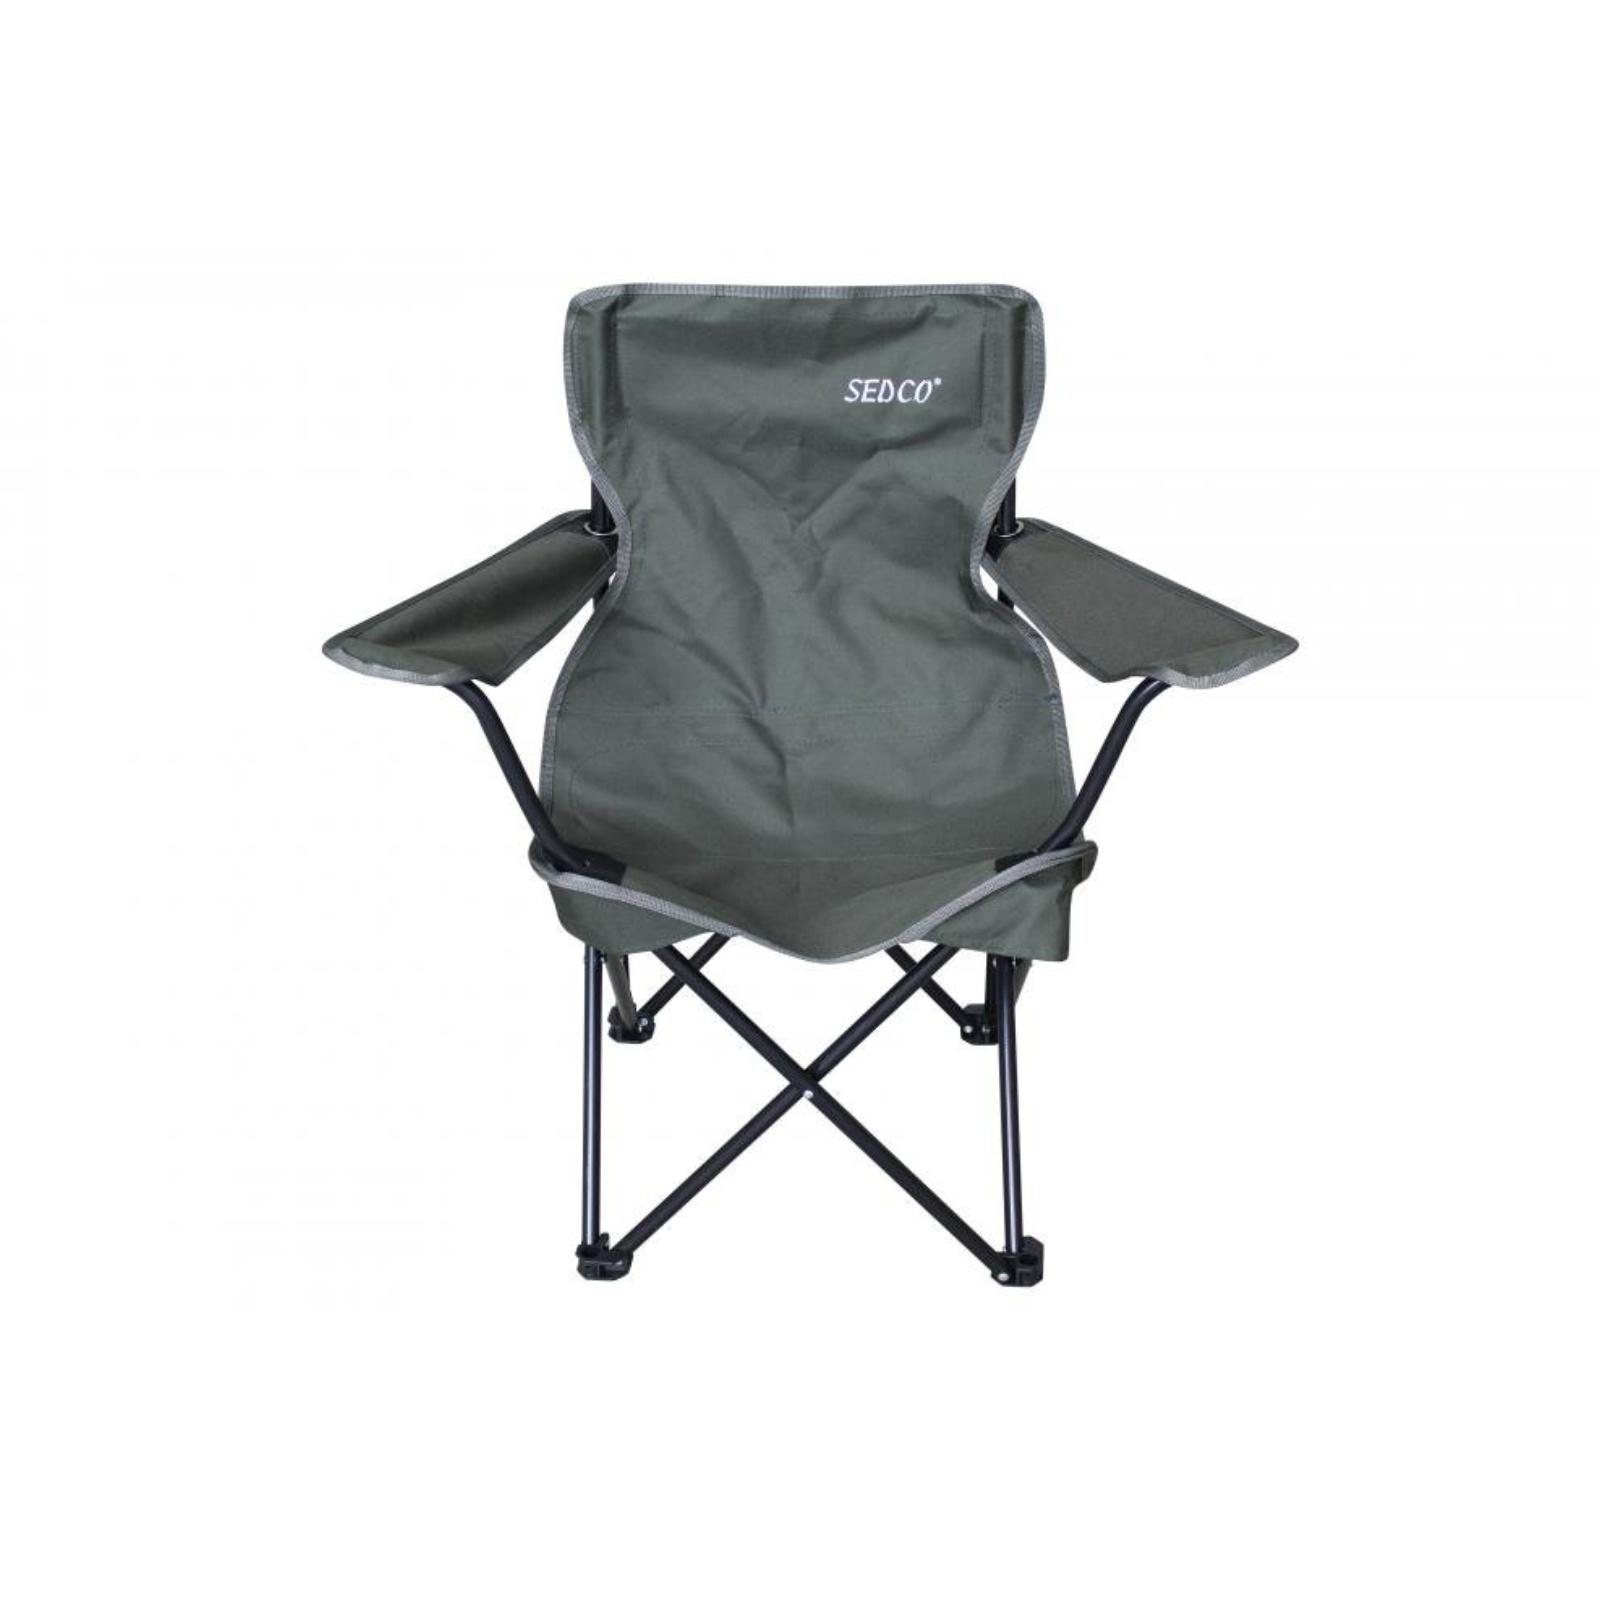 SEDCO Rybářská židle Classic KV 2018